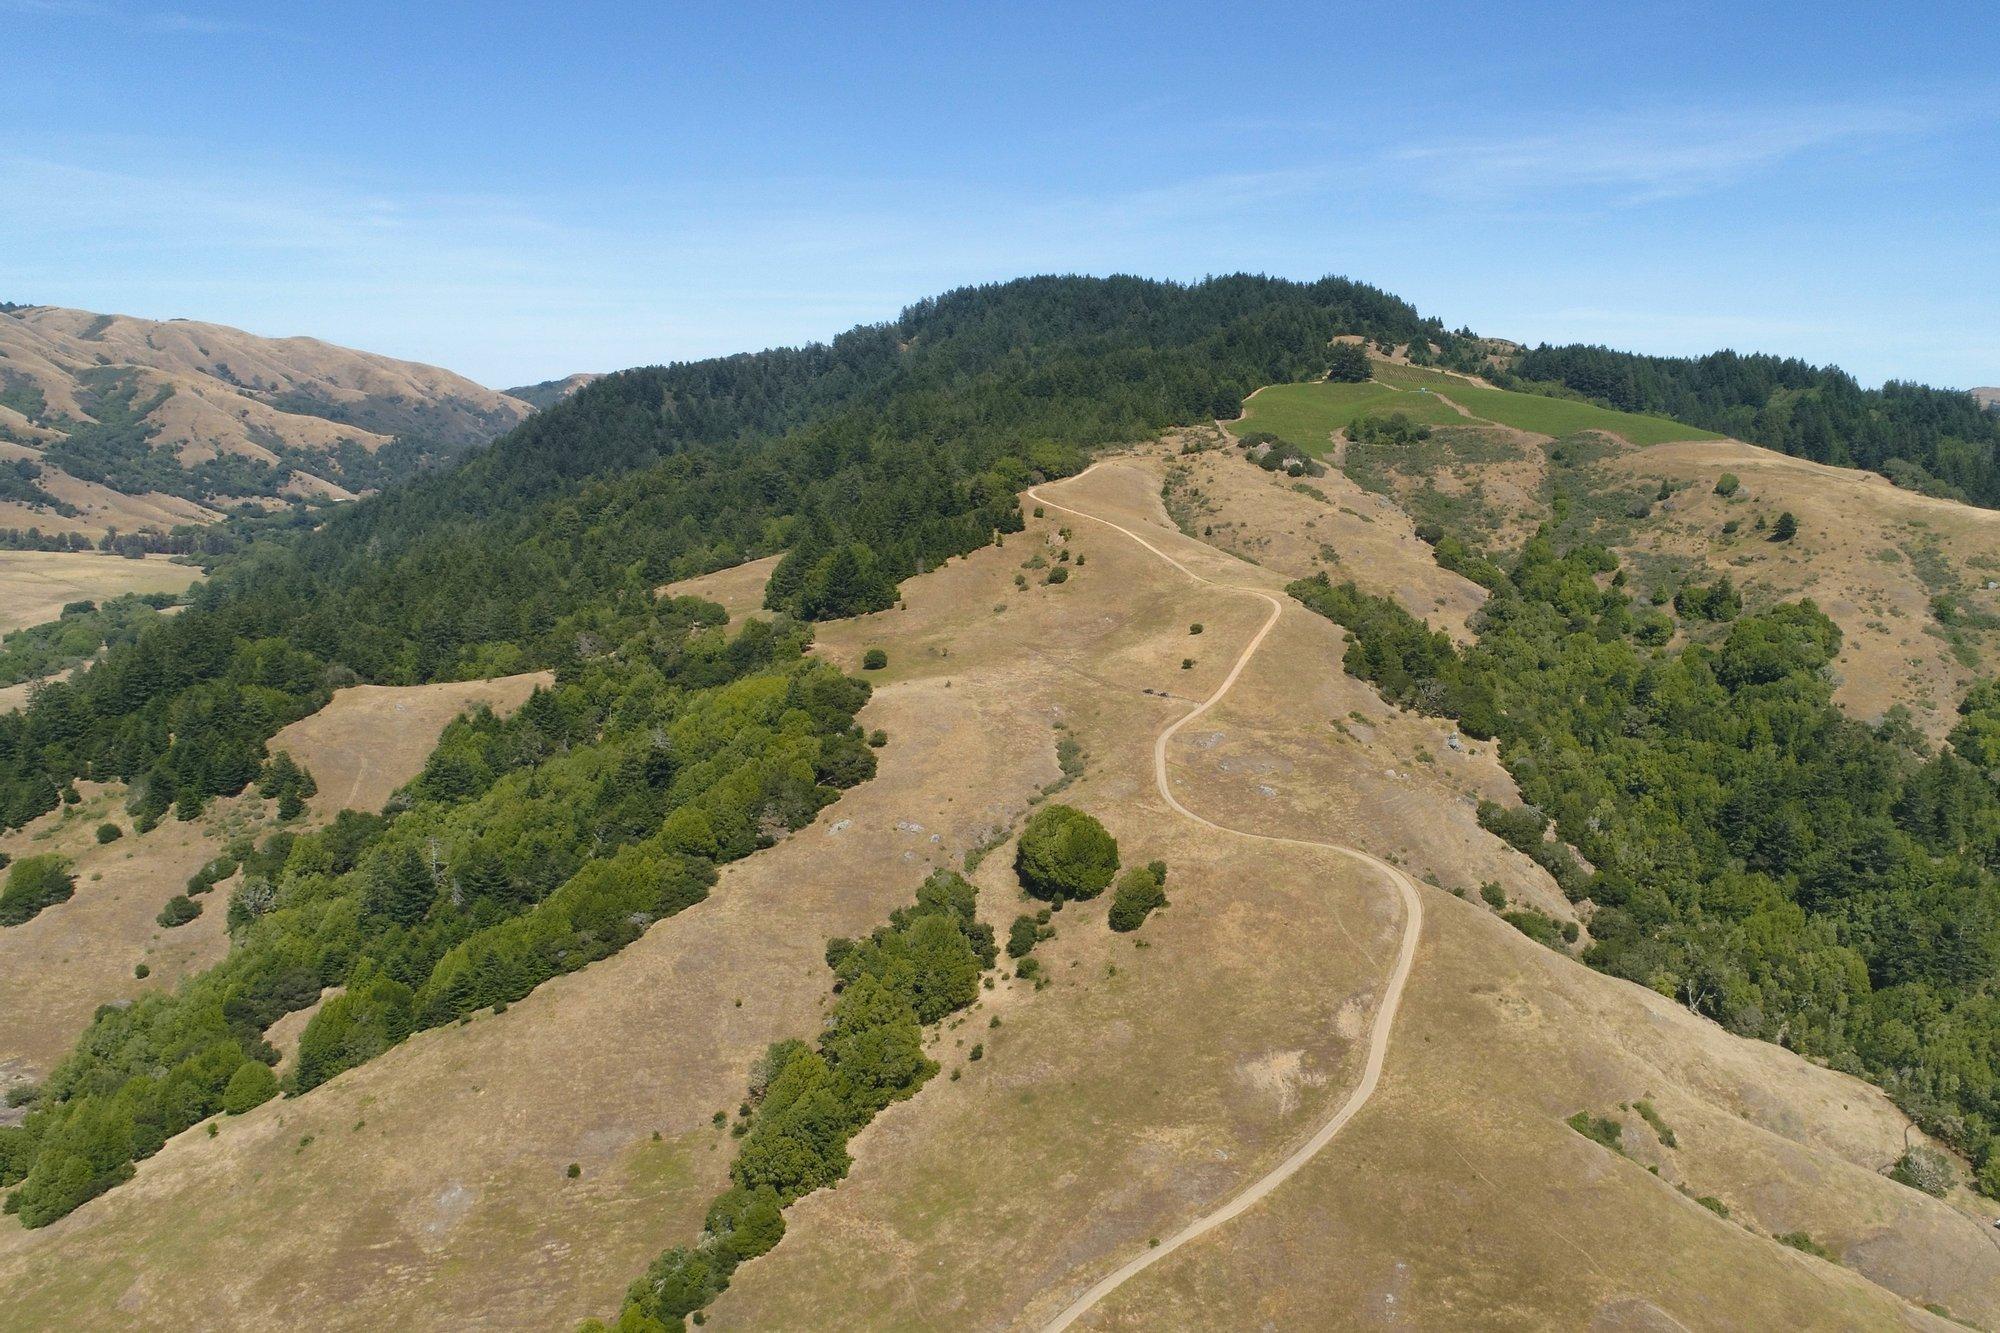 Land in 94946, California, United States 1 - 11022979